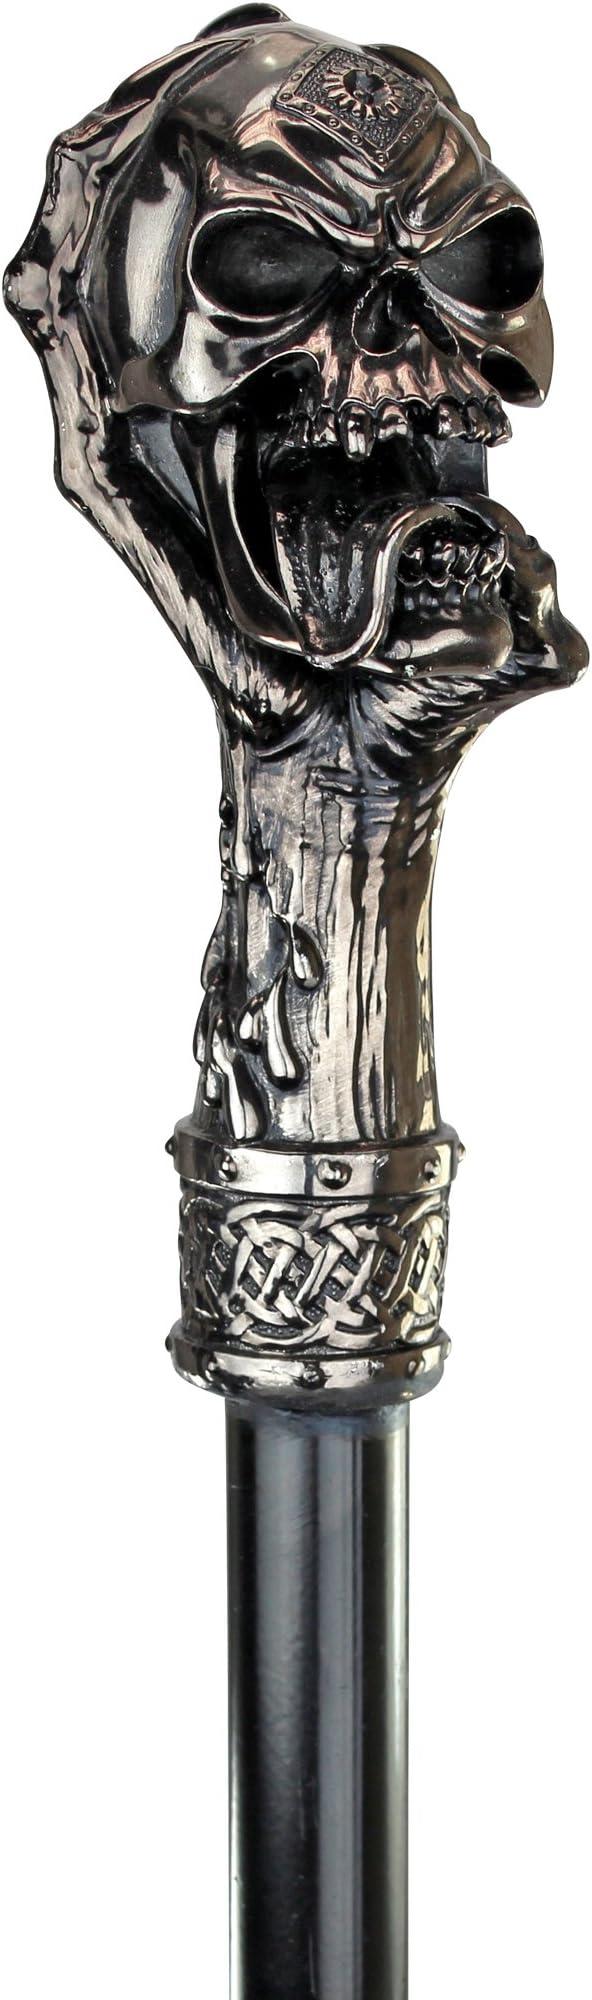 Silver Joker Skull Head Handle Vintage Style Walking Stick Cane Handmade Gift